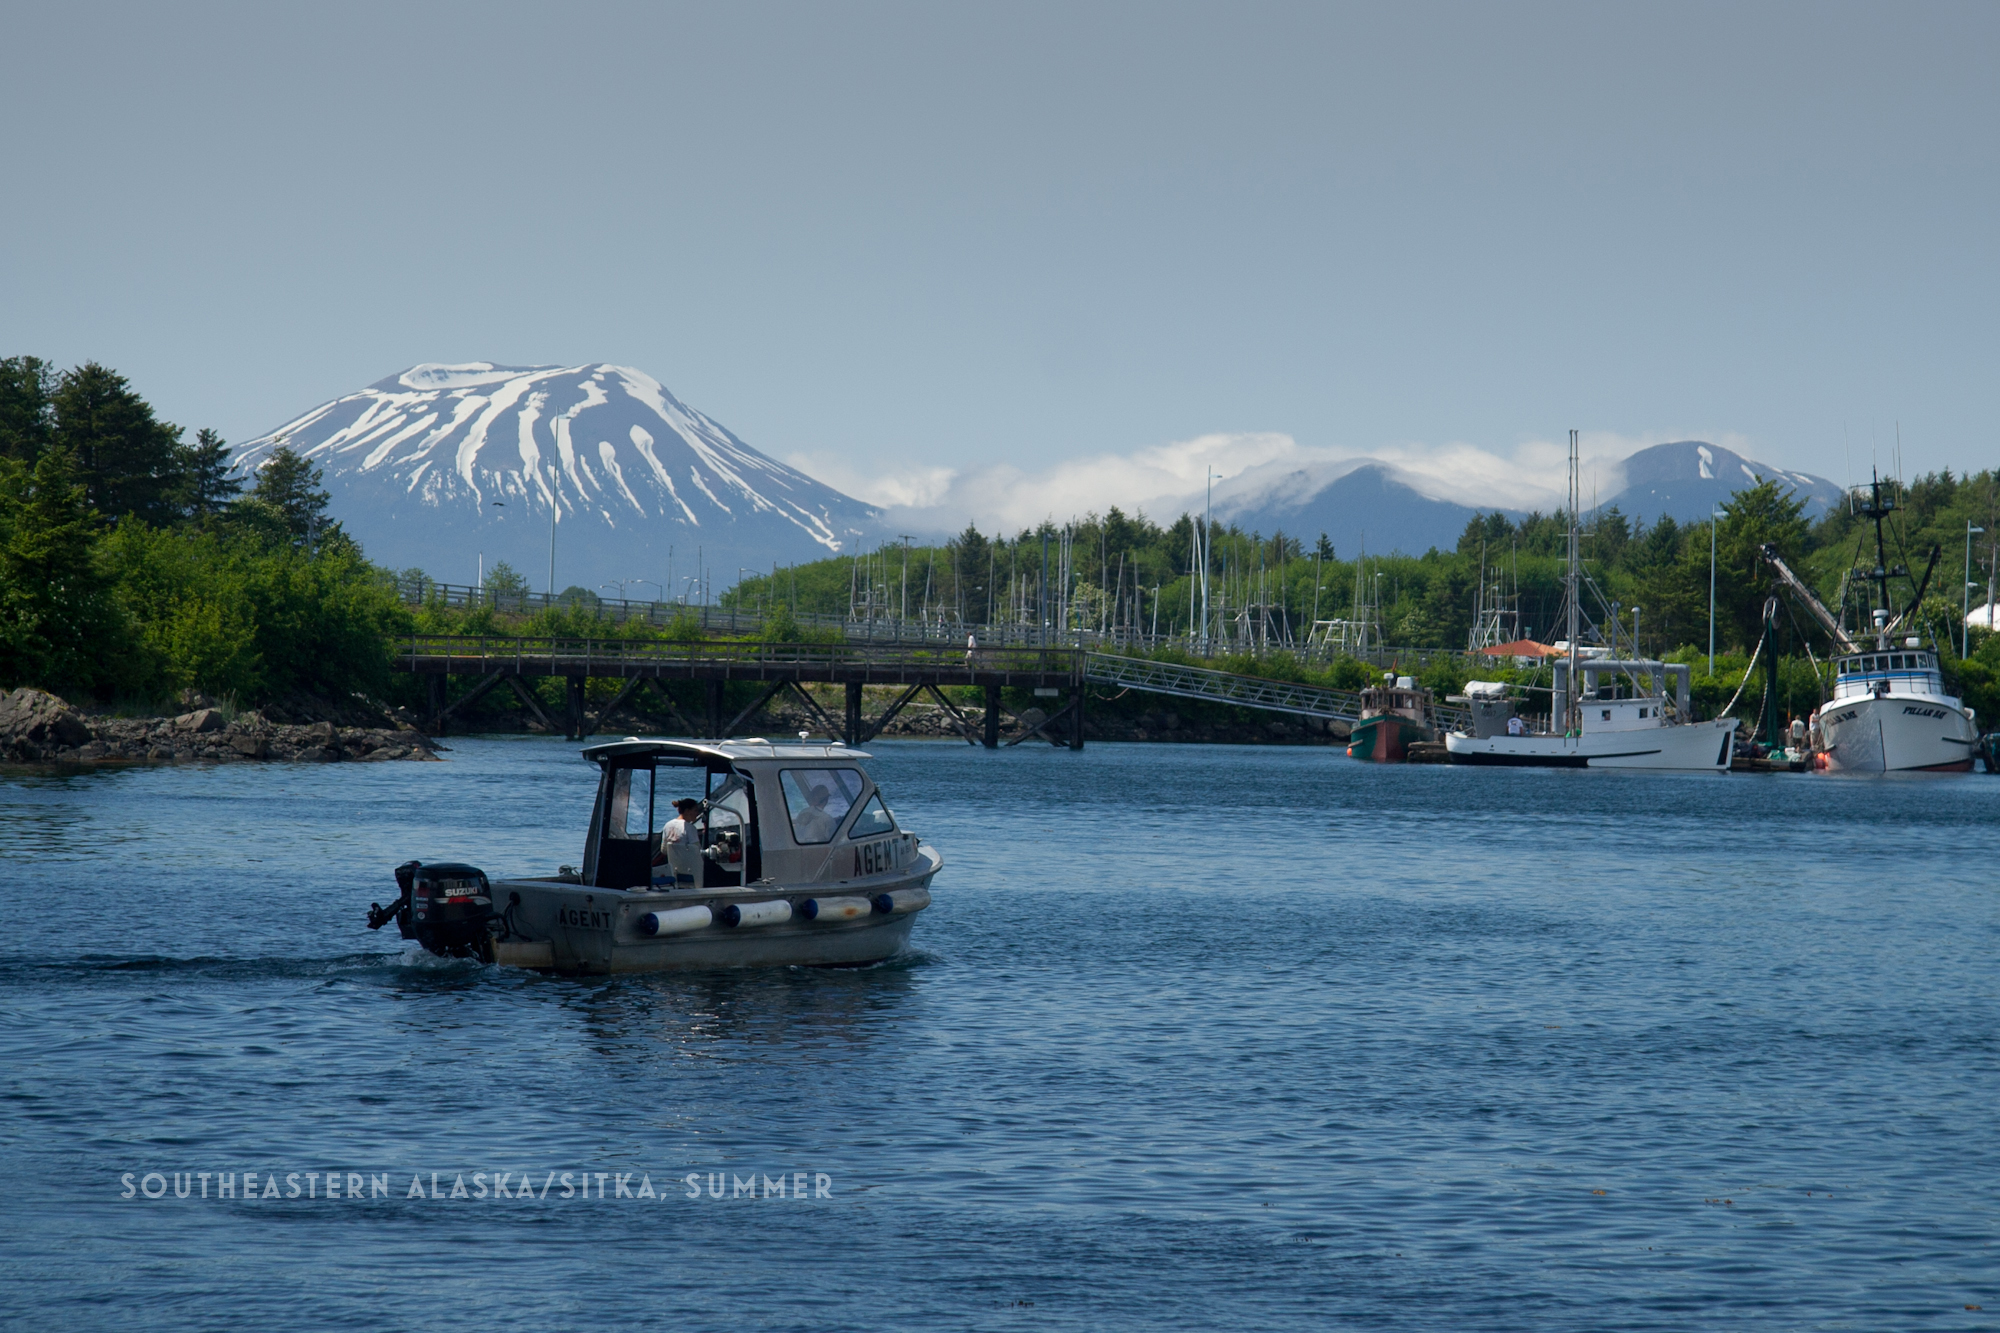 CT2 South Eastern Alaska-Sitka summer.jpg